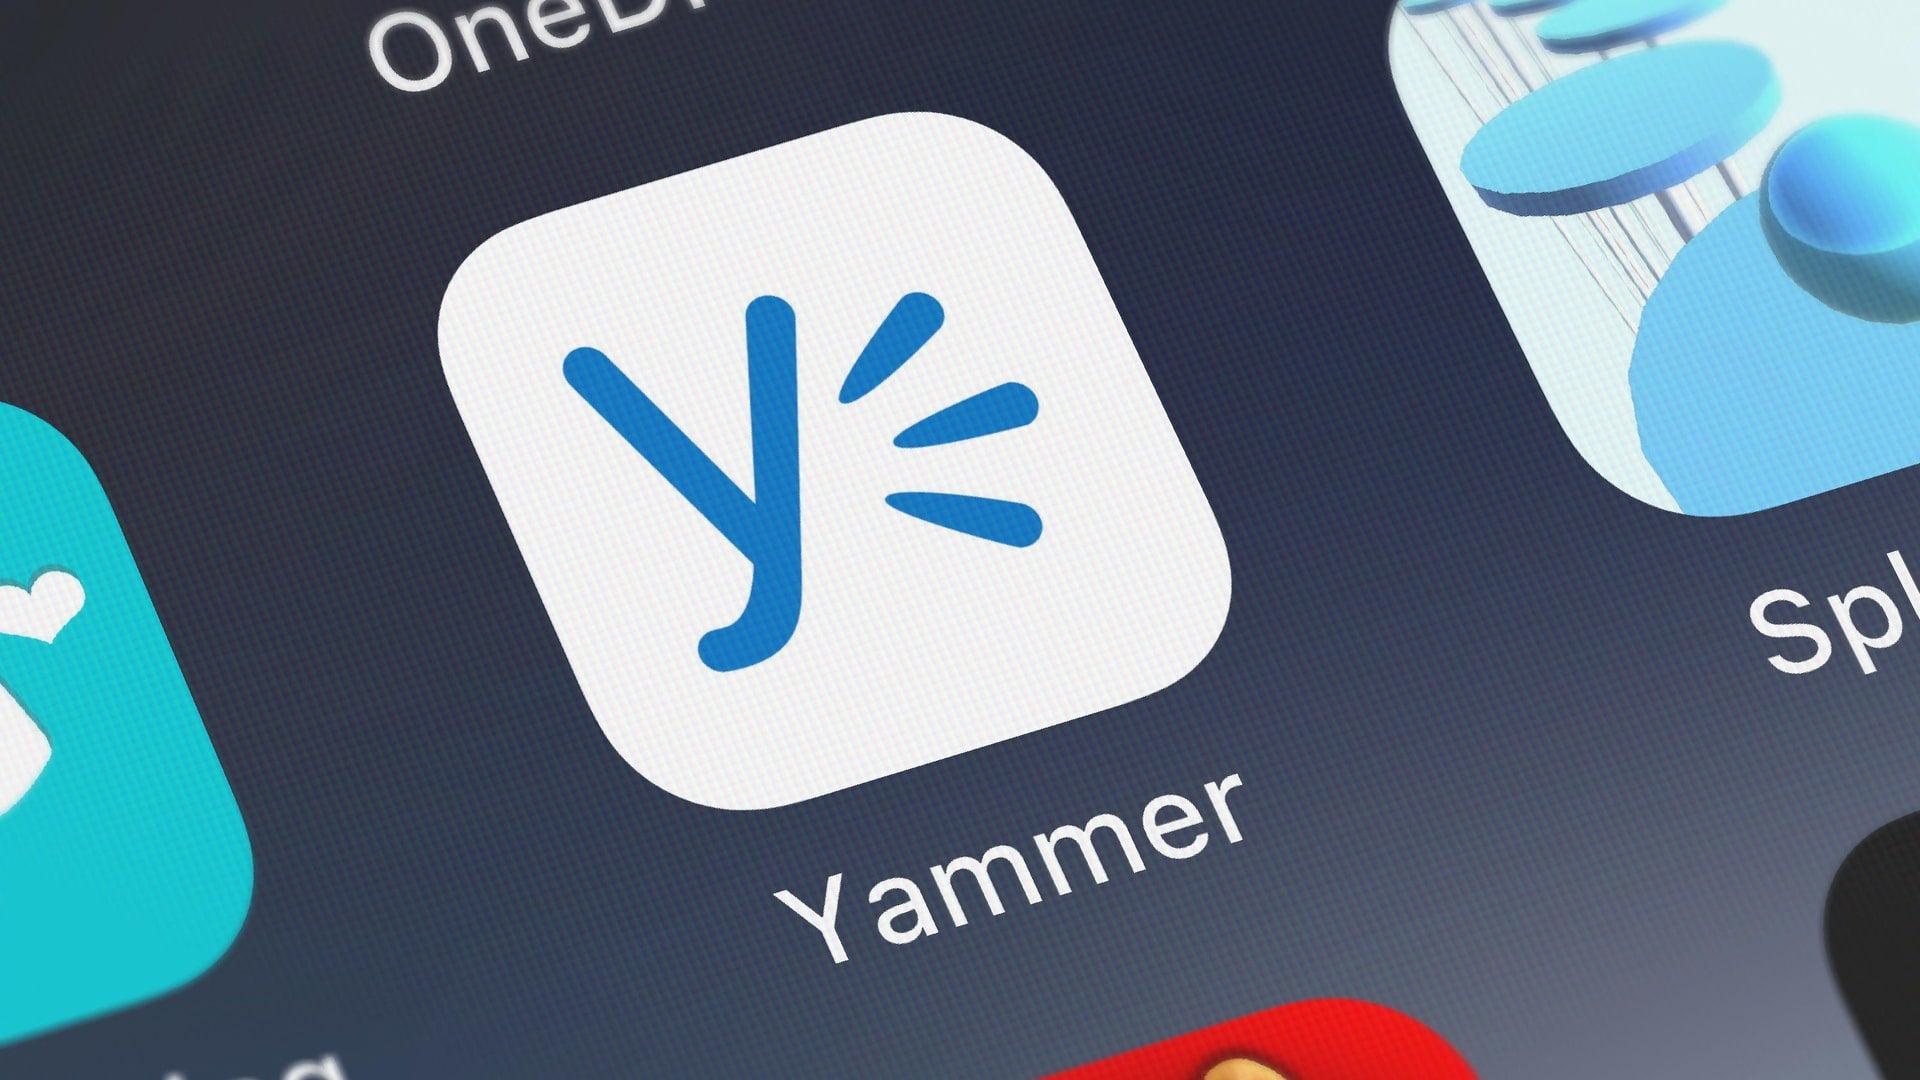 Yammer-min.jpg